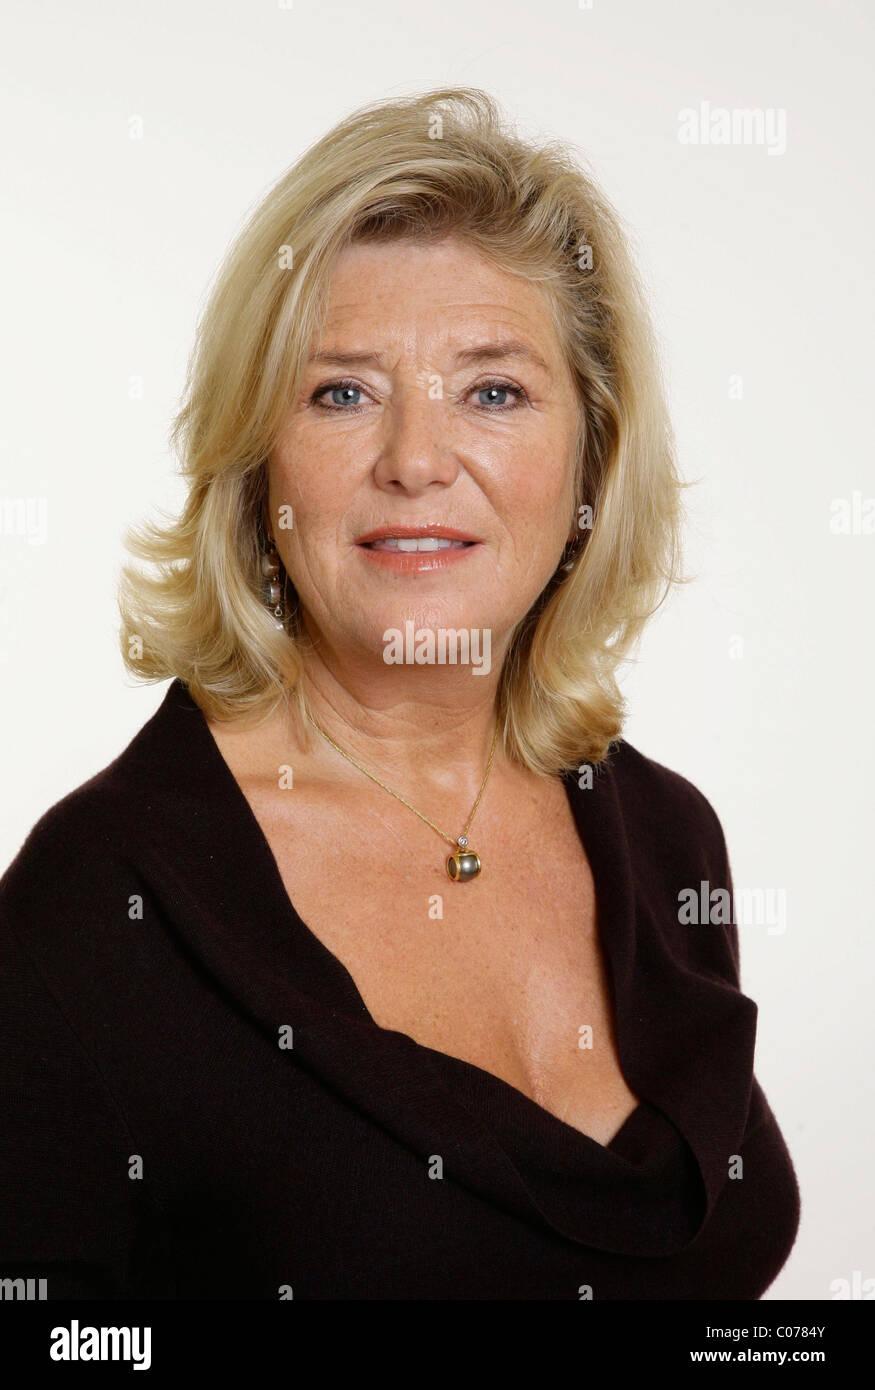 Jutta Speidel Nude Photos 42